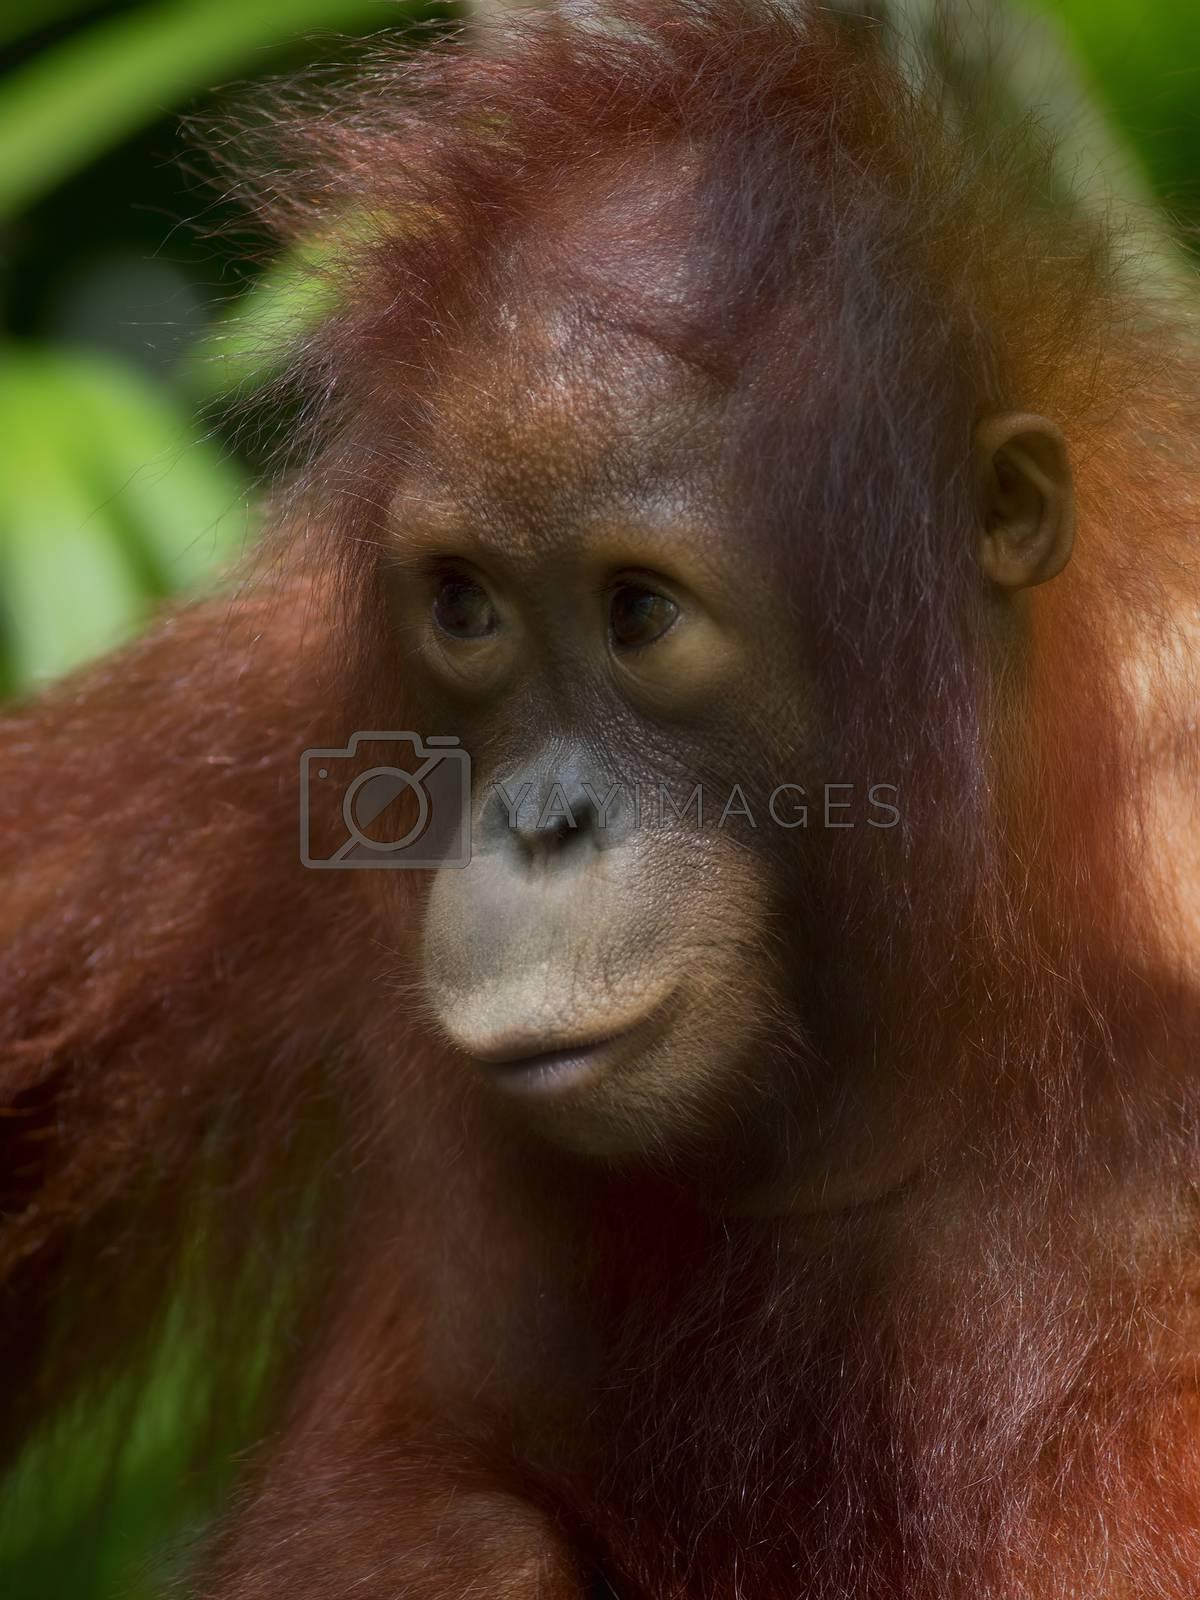 Royalty free image of Borneo Orangutan by kjorgen